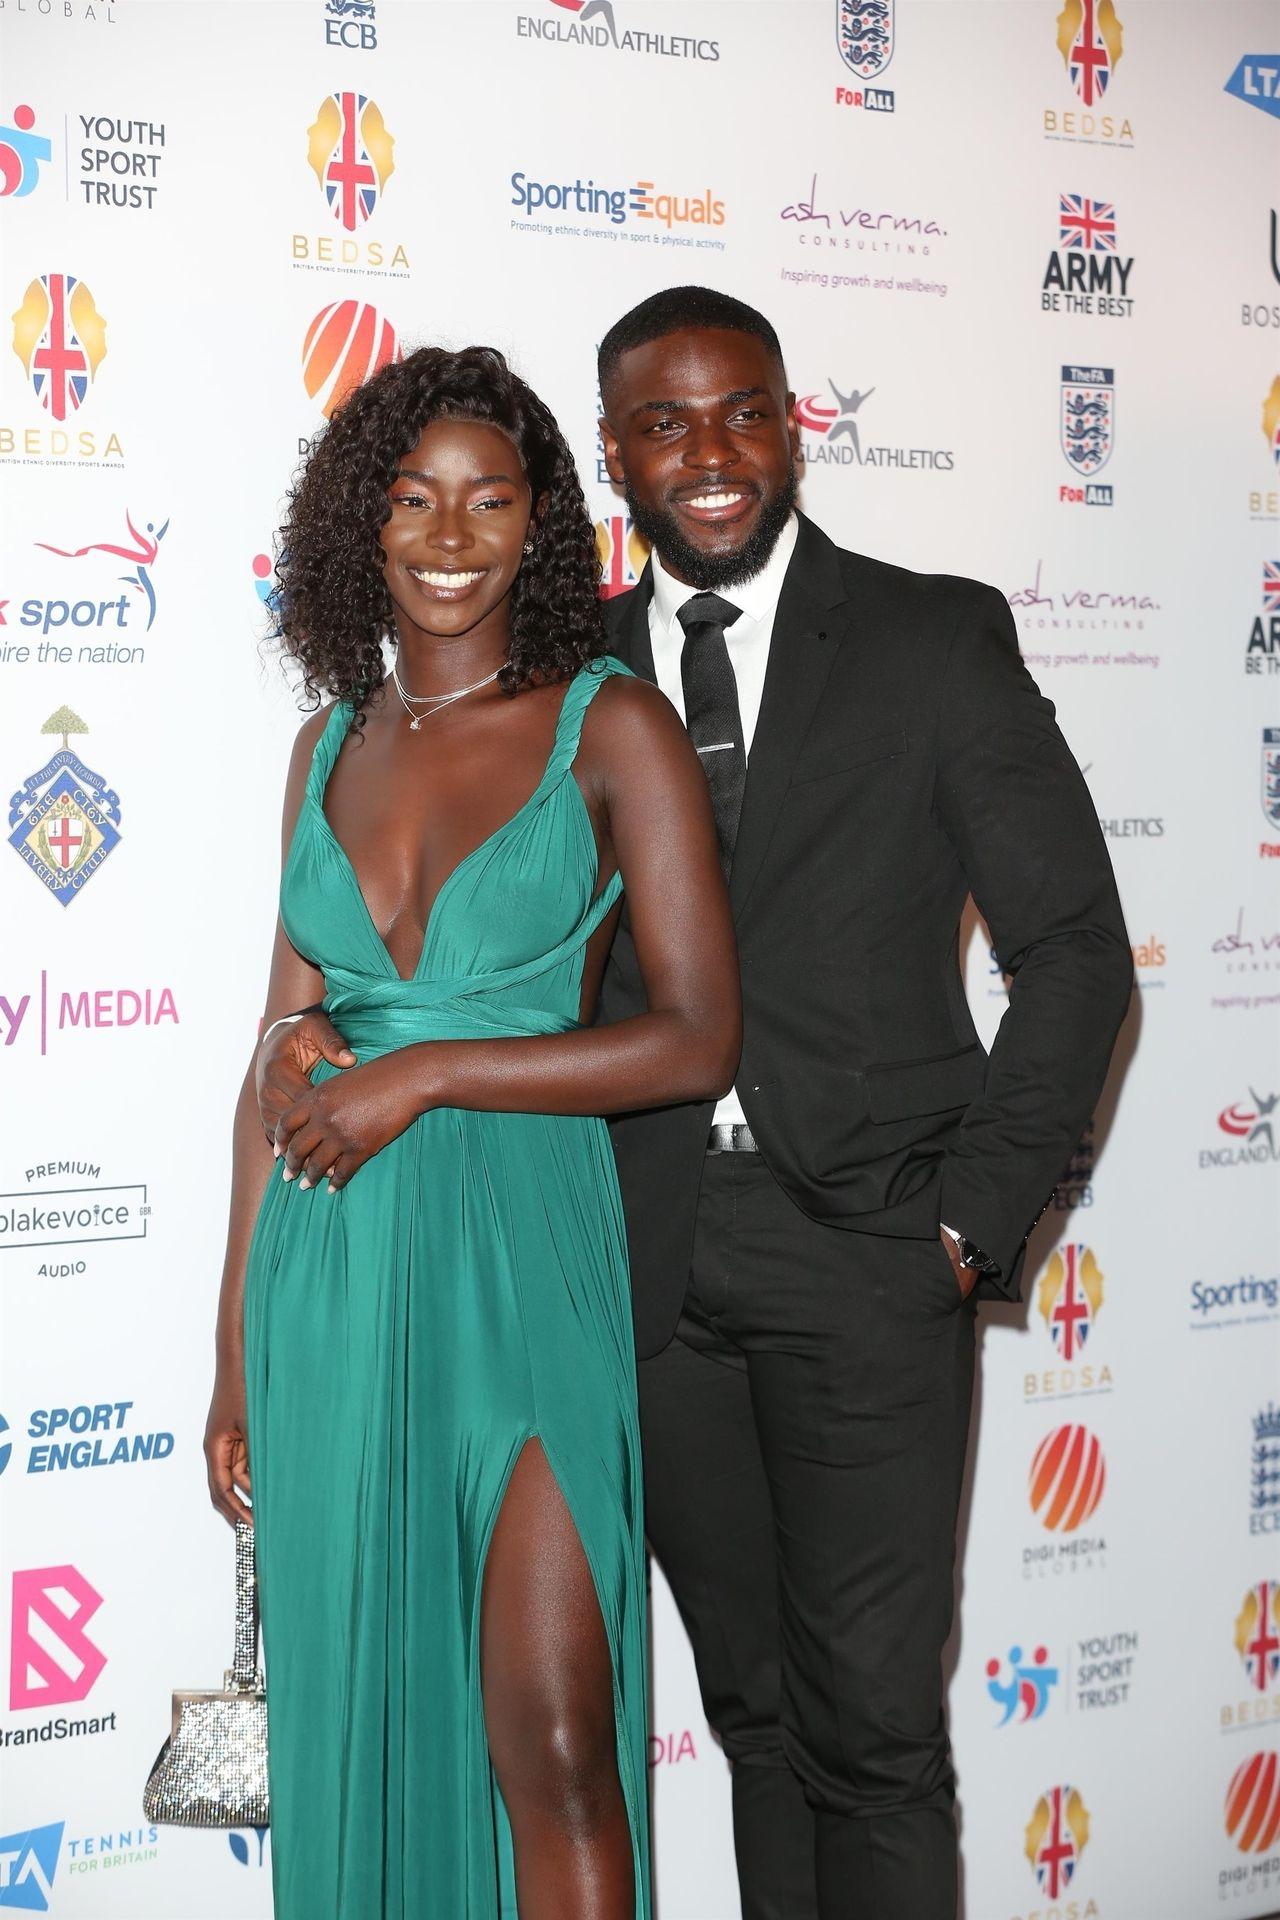 Mike Boateng & Priscilla Anyabu Are Seen At British Ethnic Diversity Sports Awards 0038